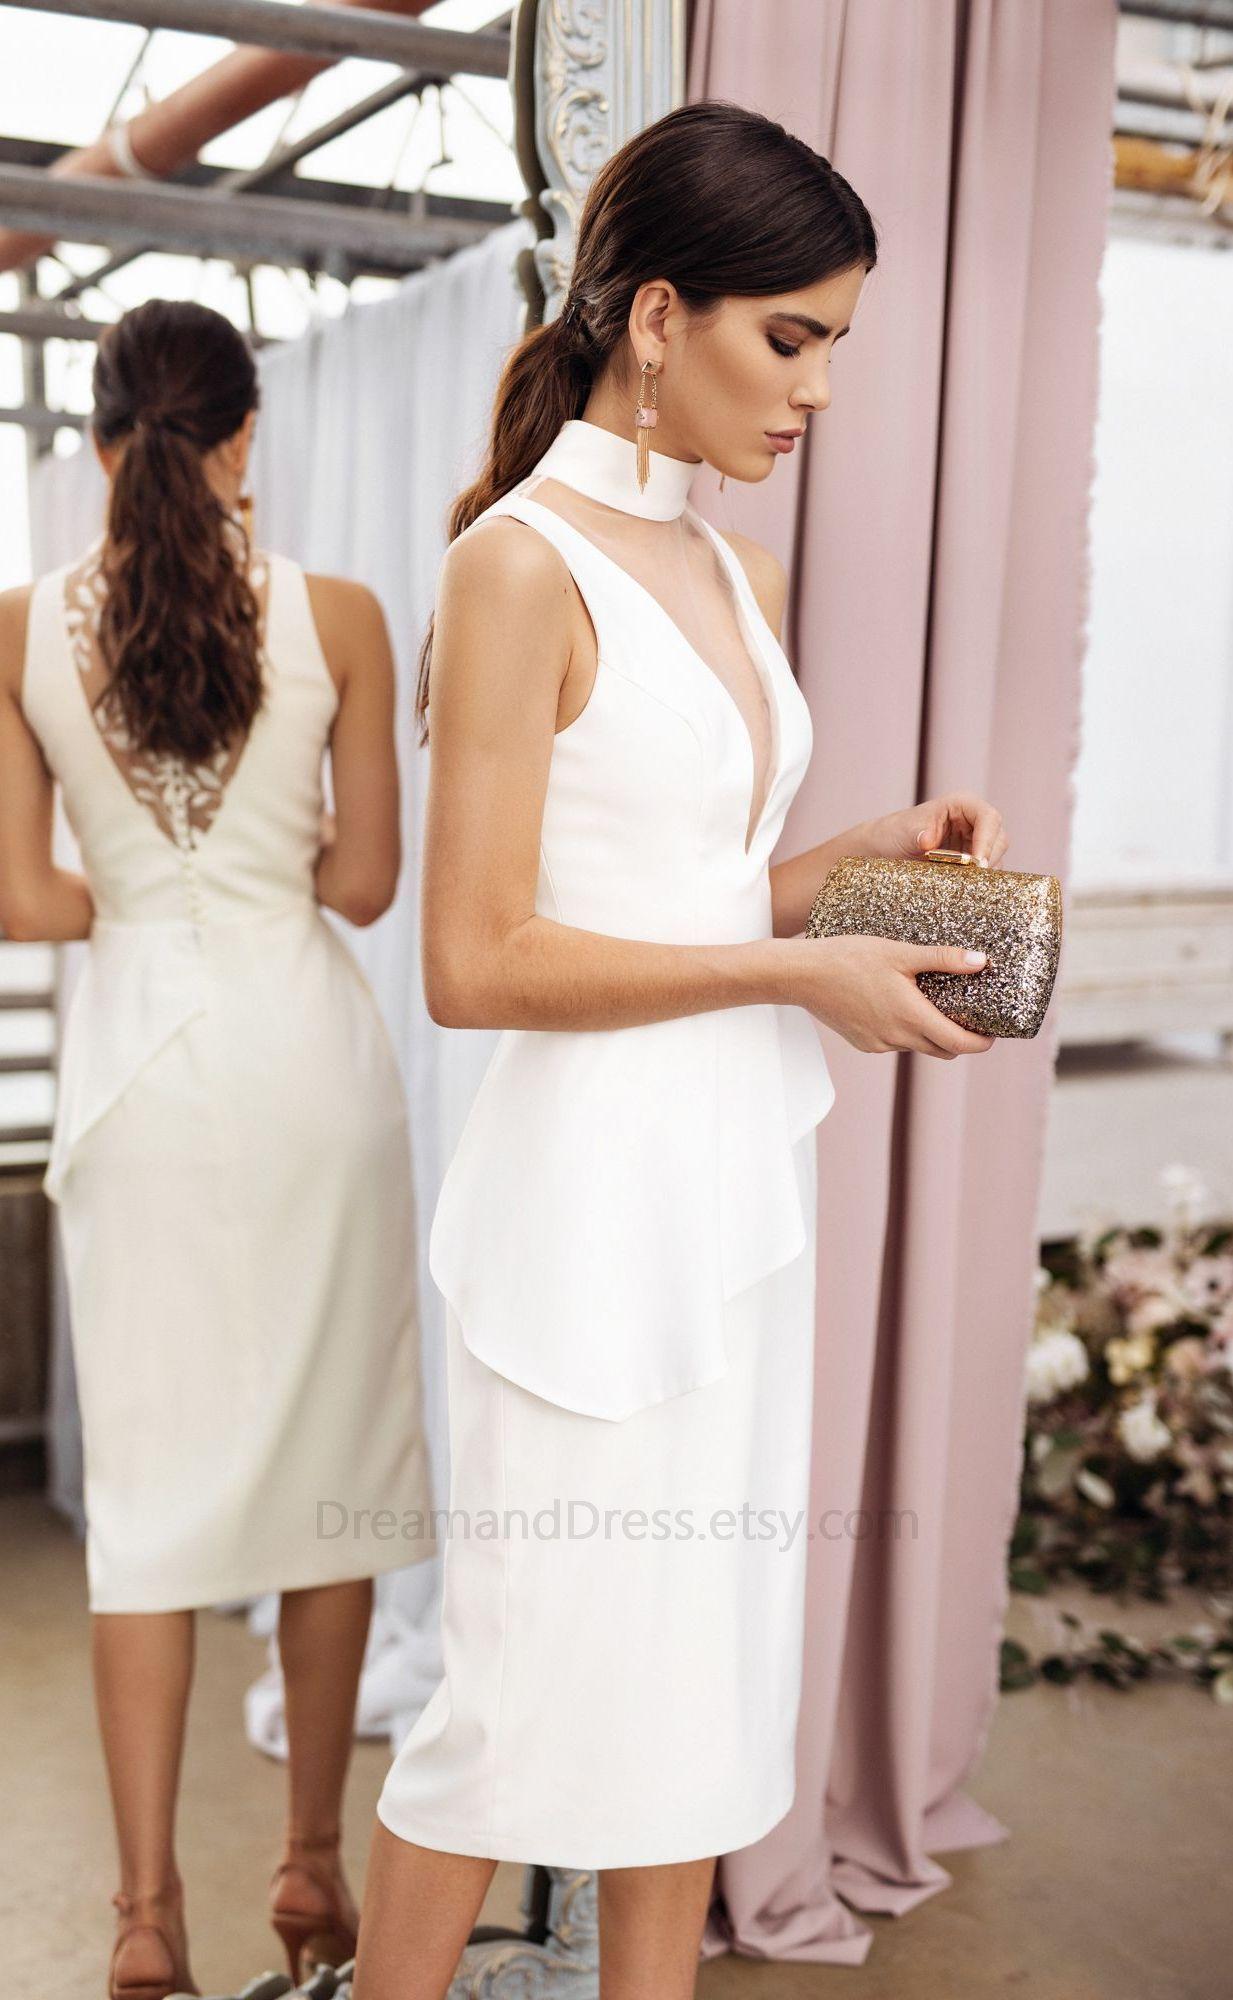 Midi Satin Wedding Dress By Dream Dress Minimalist Simple Bridal Gown V Neck Reception Pencil In 2021 Trendy Wedding Dresses Chic Wedding Dresses Simple Bridal Gowns [ 2000 x 1233 Pixel ]